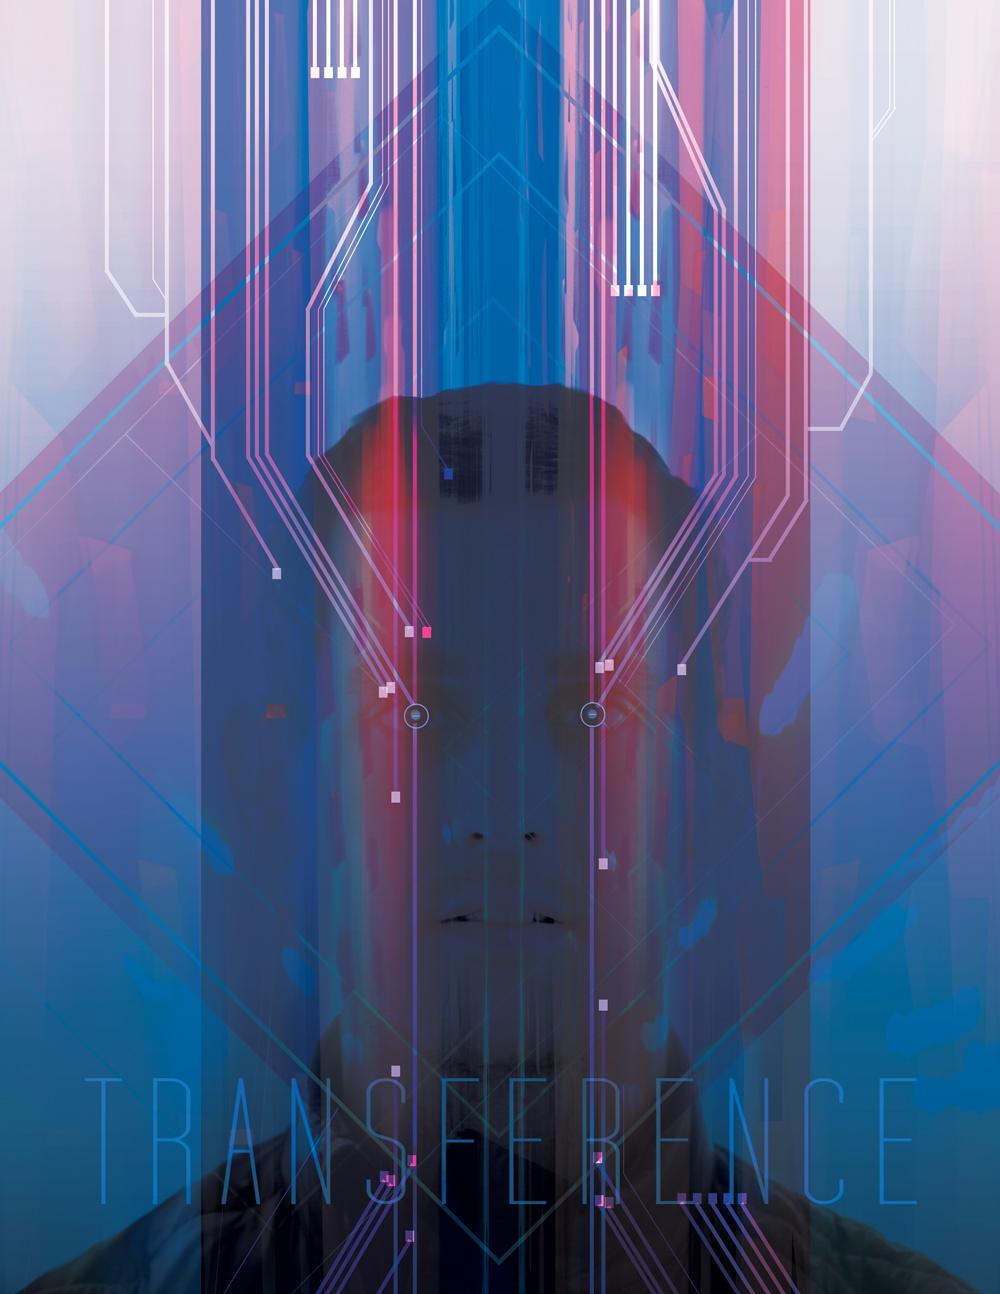 transference_5b.jpg